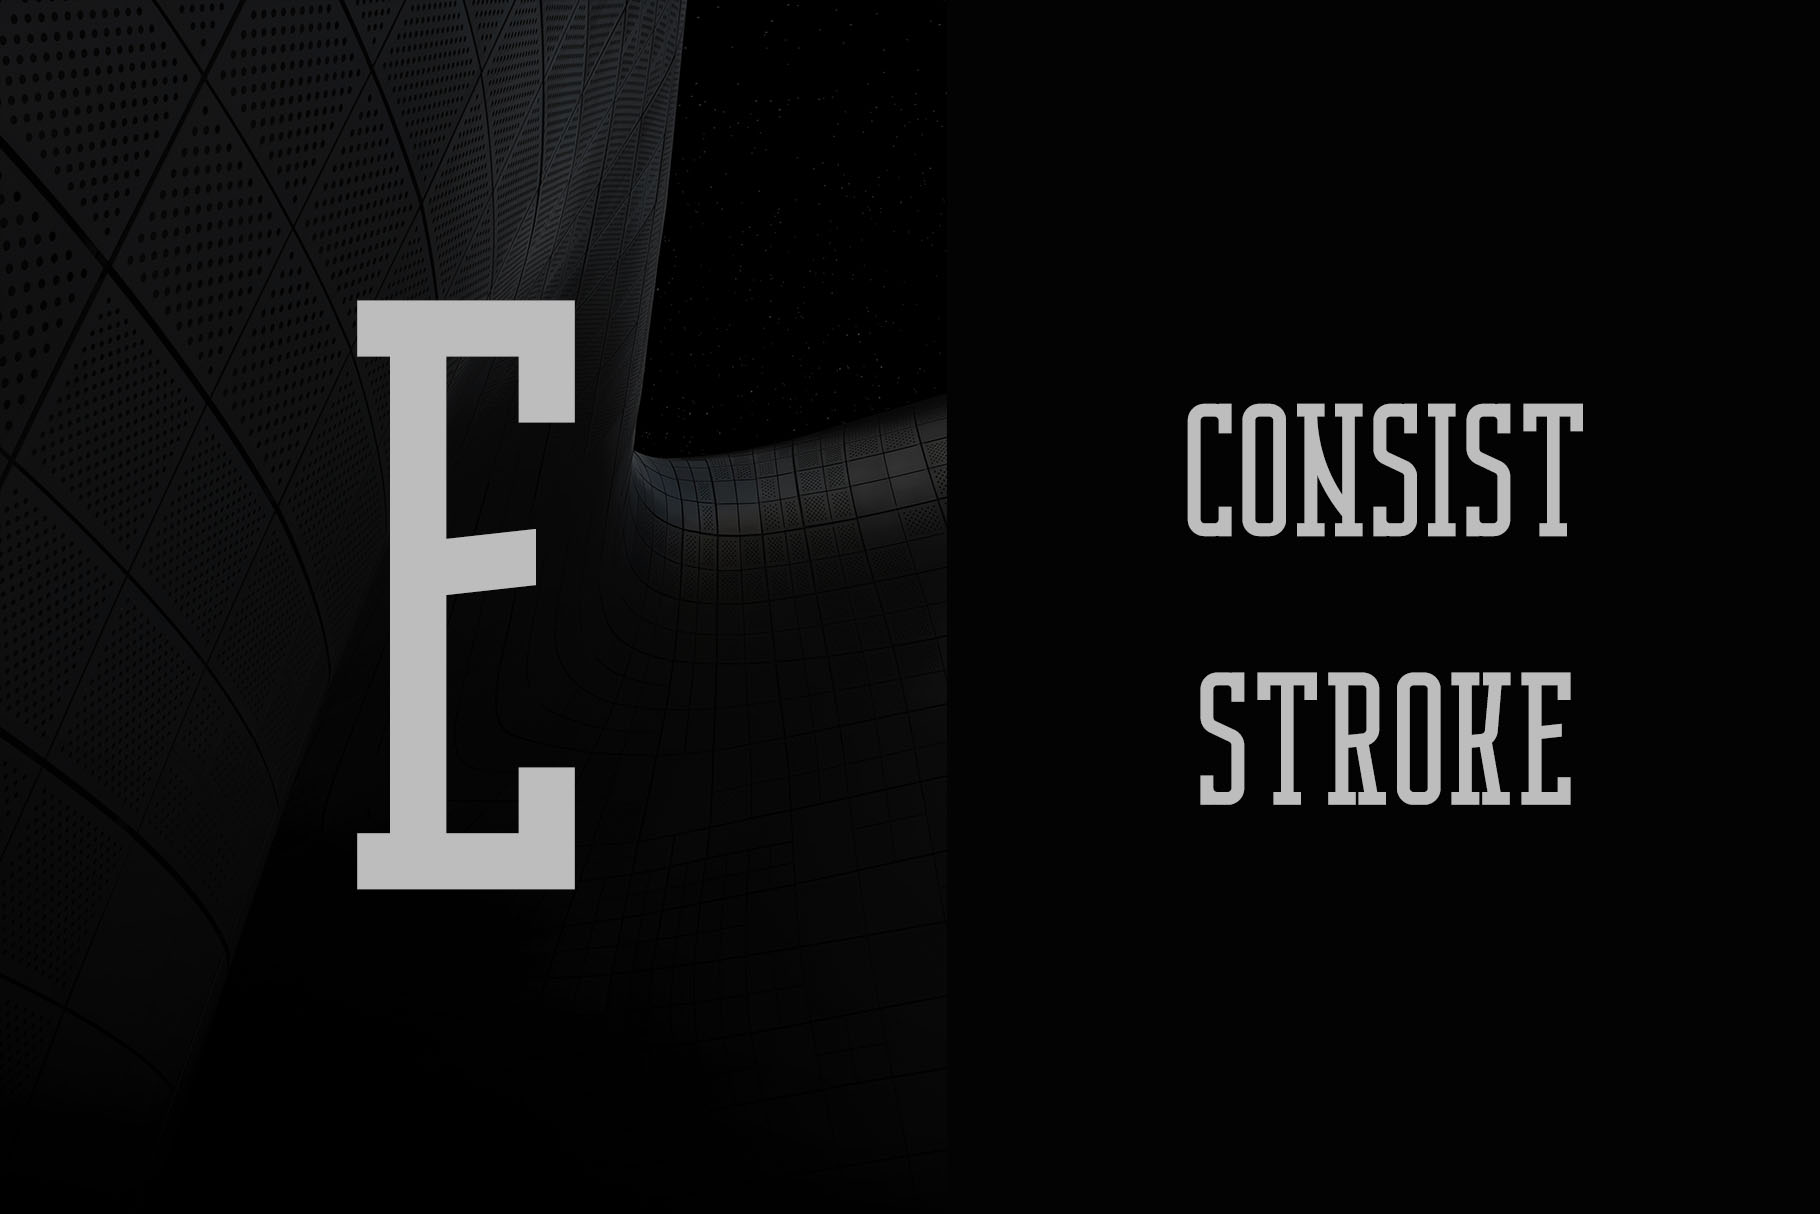 Nordin Slab - Condensed Slab Serif example image 5